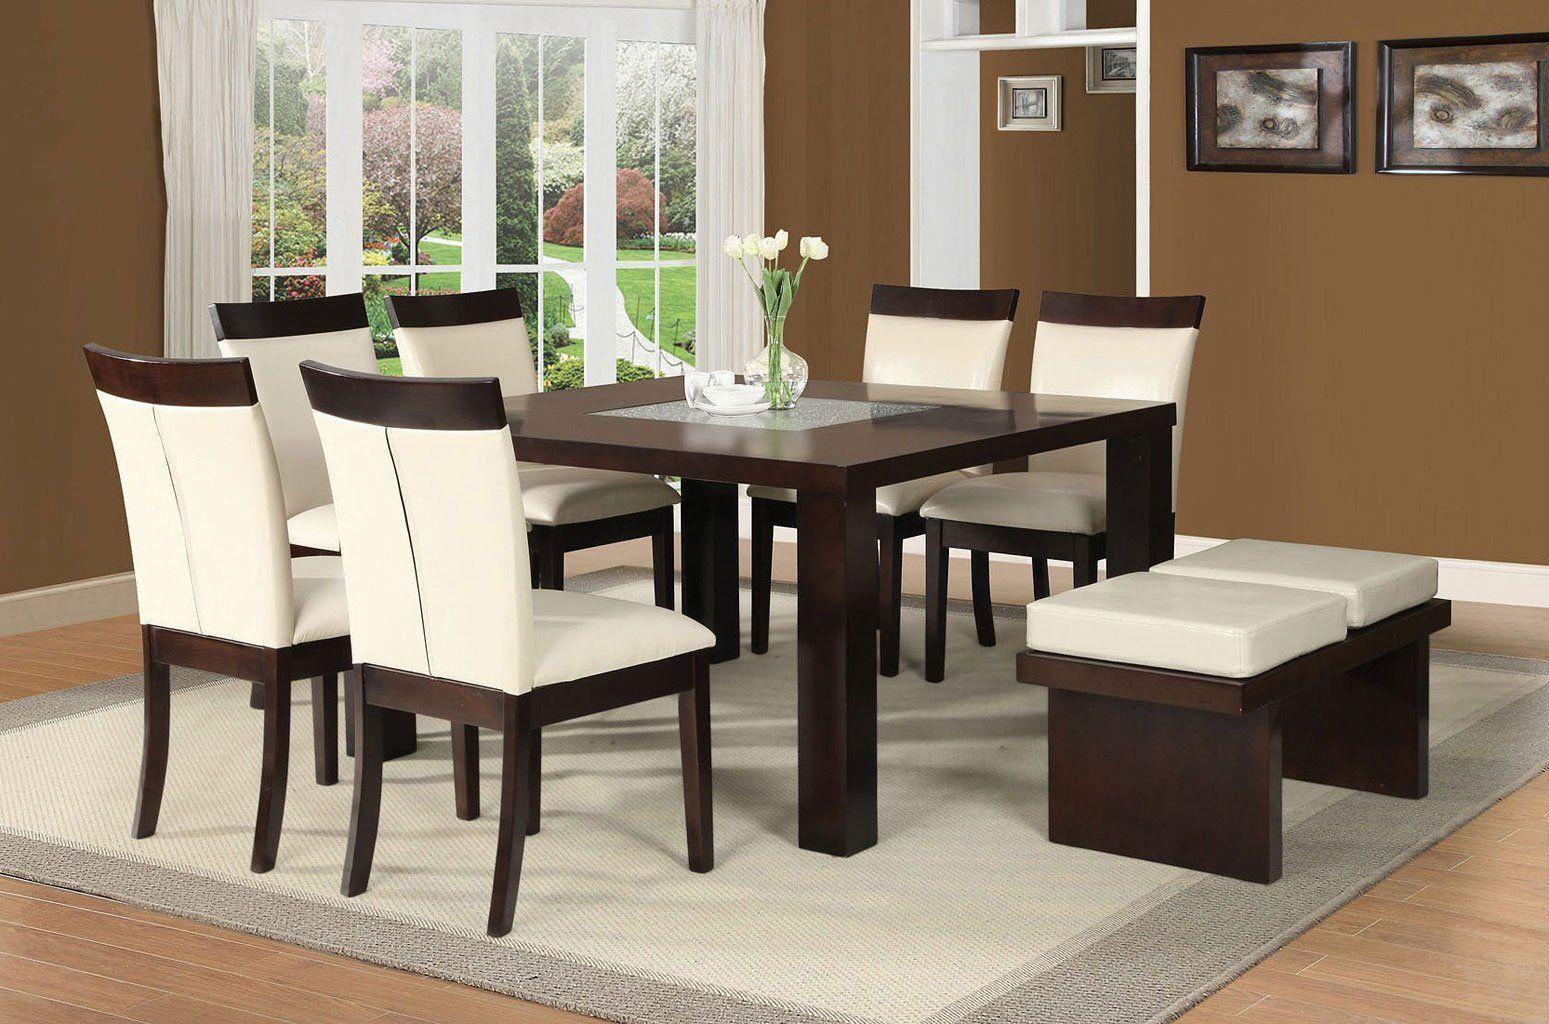 Keelin Dining Room Set Square Dining Room Table Modern Dining